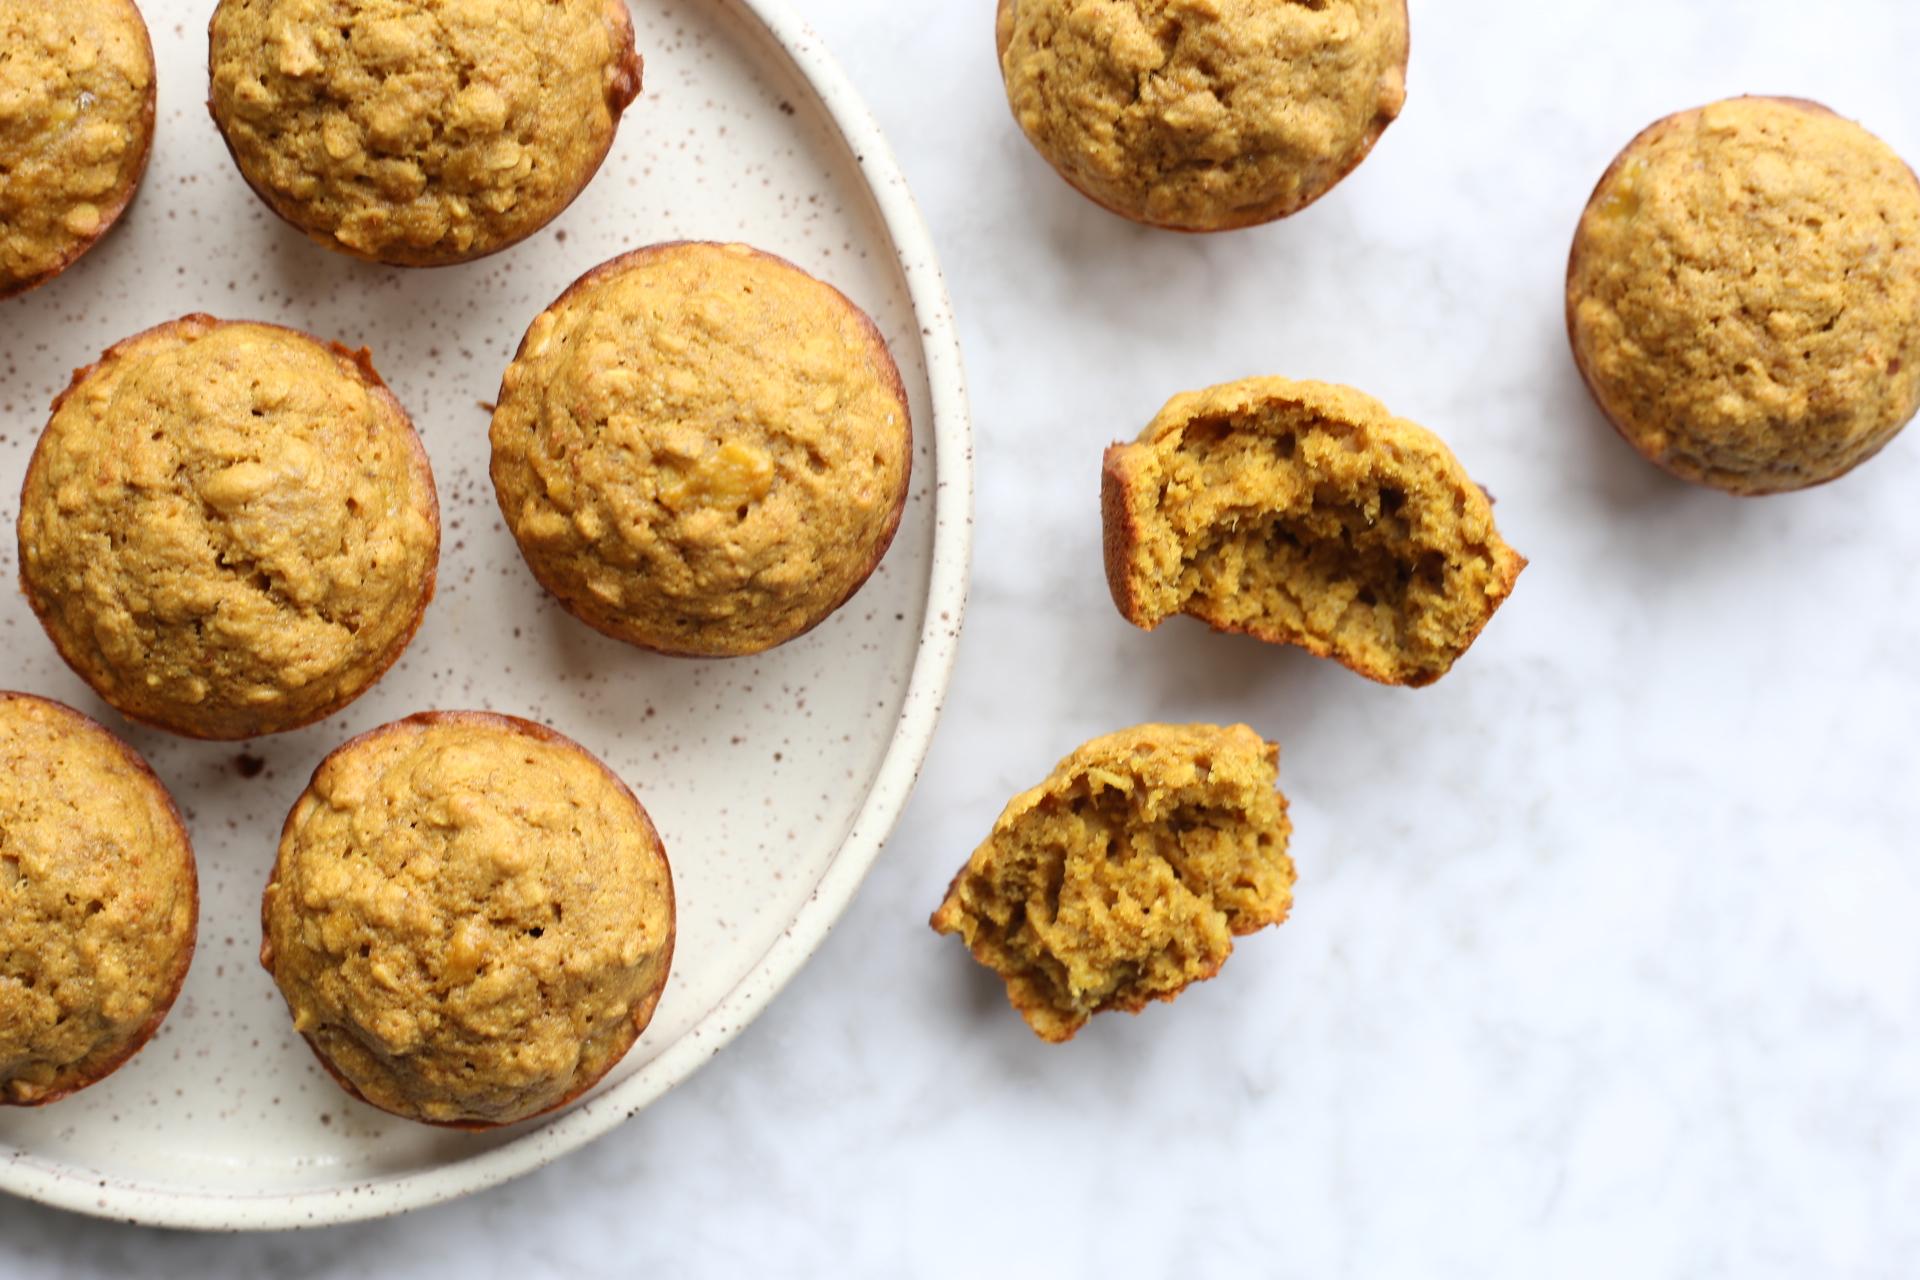 majka lactation boosting whole wheat banana muffins